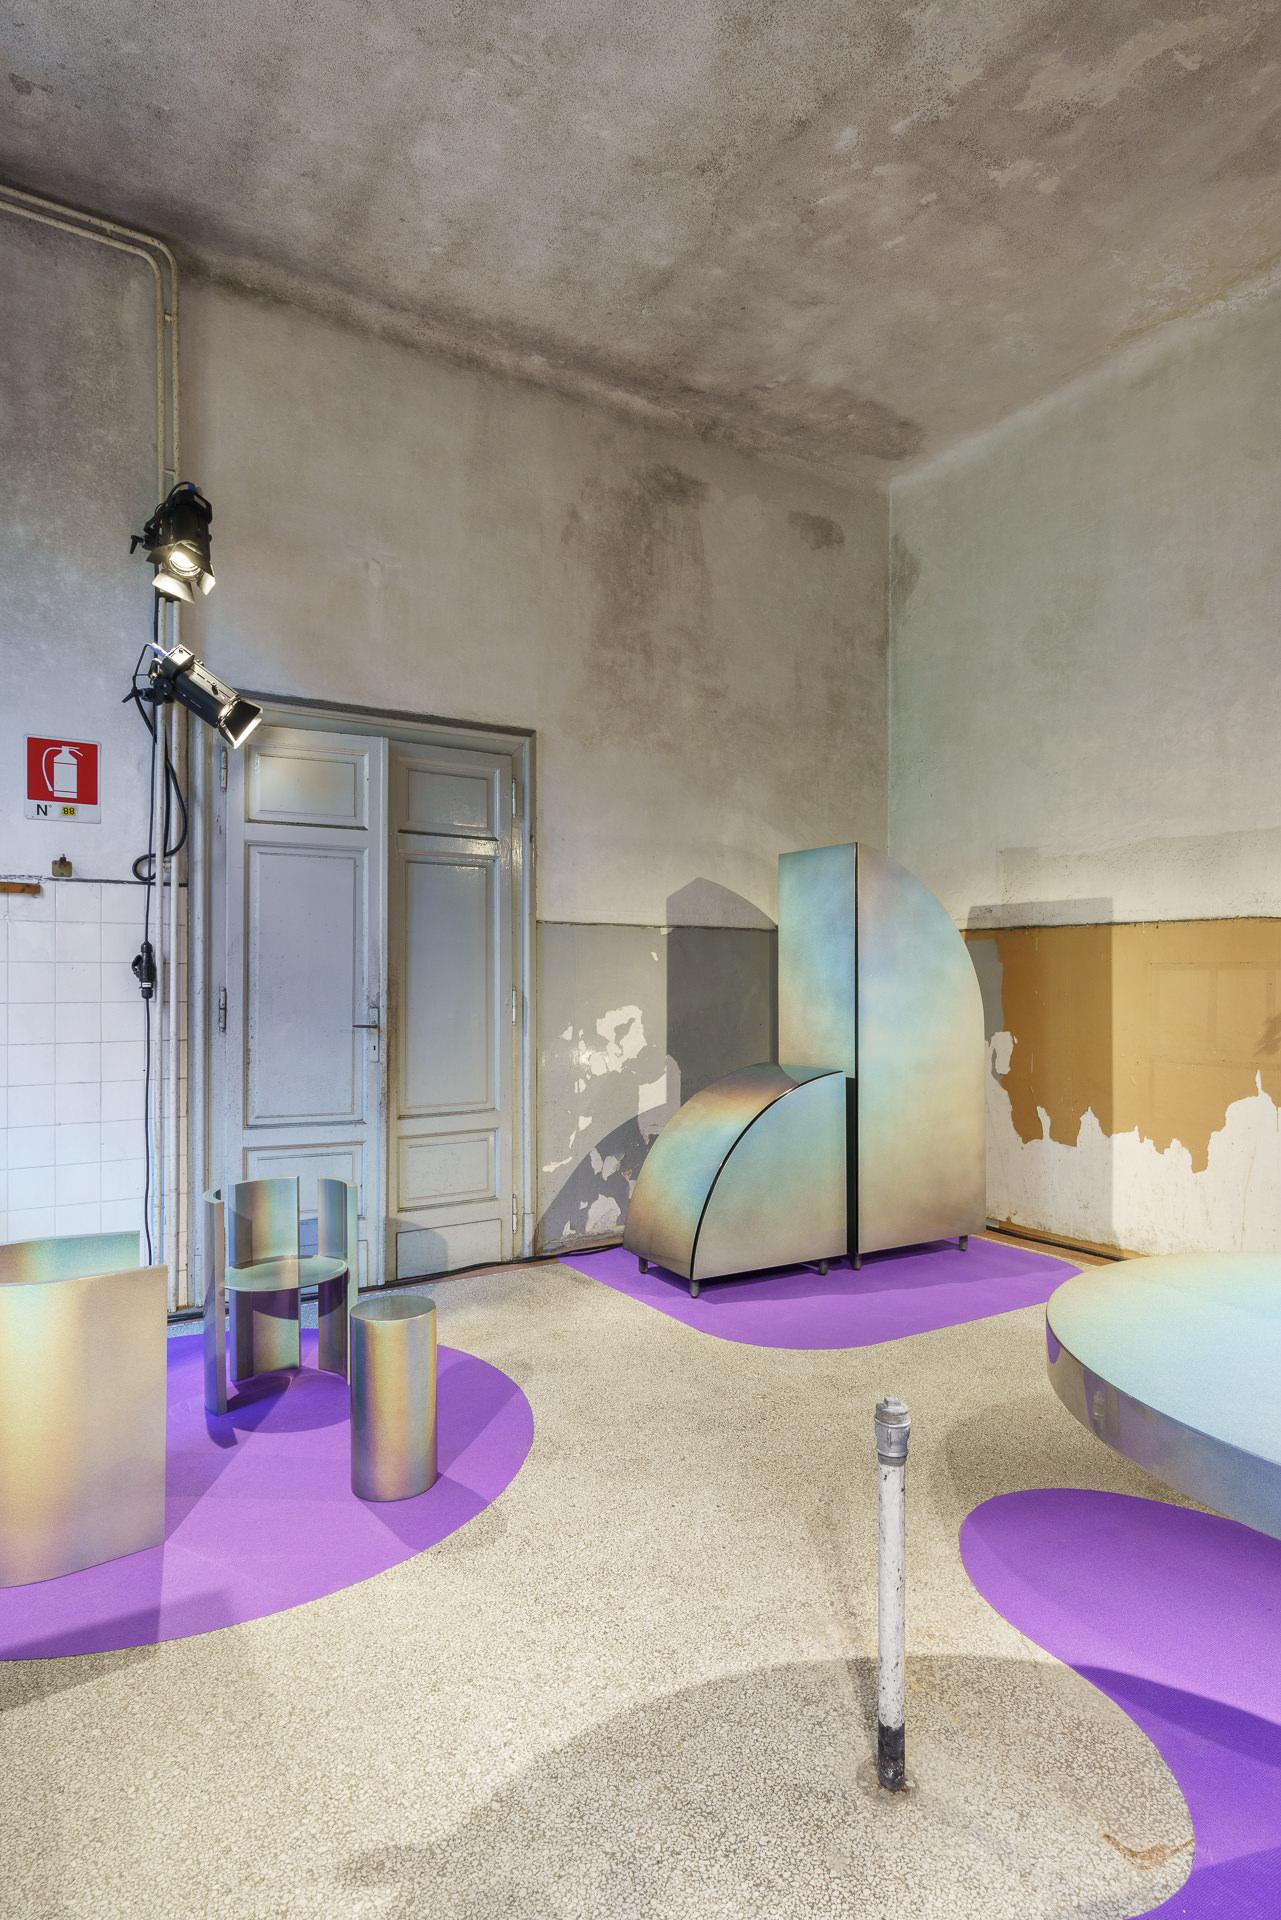 Alcova Milan 2021 Objects Of Common Interest Etage Photo Dsl Studio Piercarlo Quecchia Yellowtrace